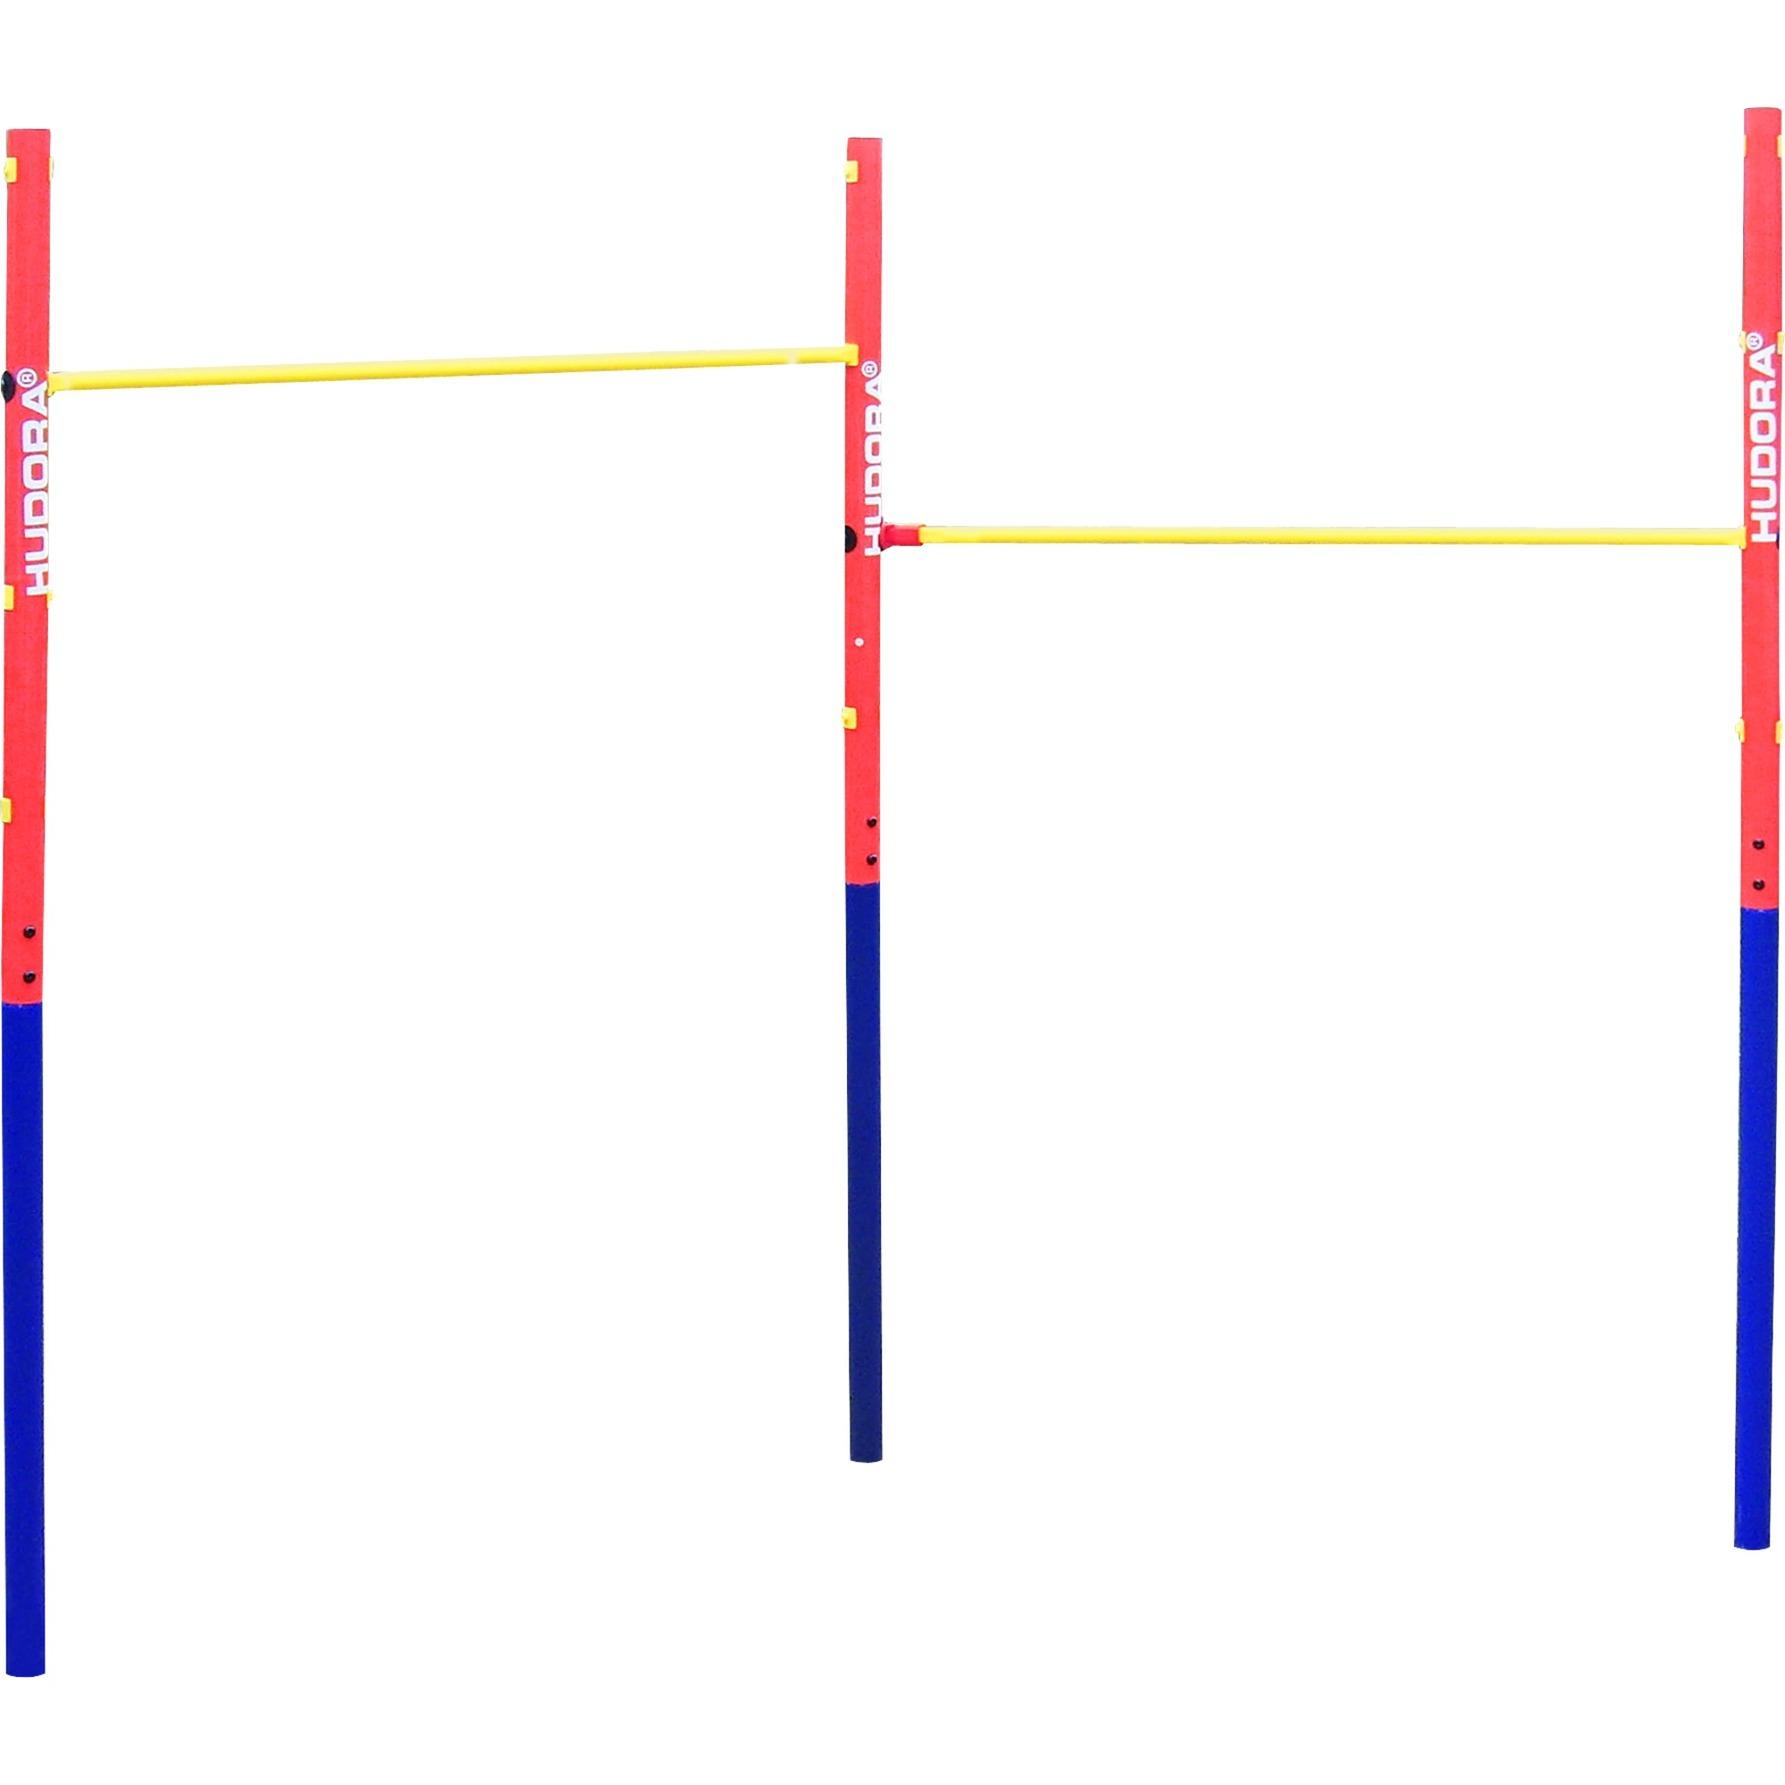 64002 barra dominada 100 kg Azul, Rojo, Amarillo, Aparato para fitness